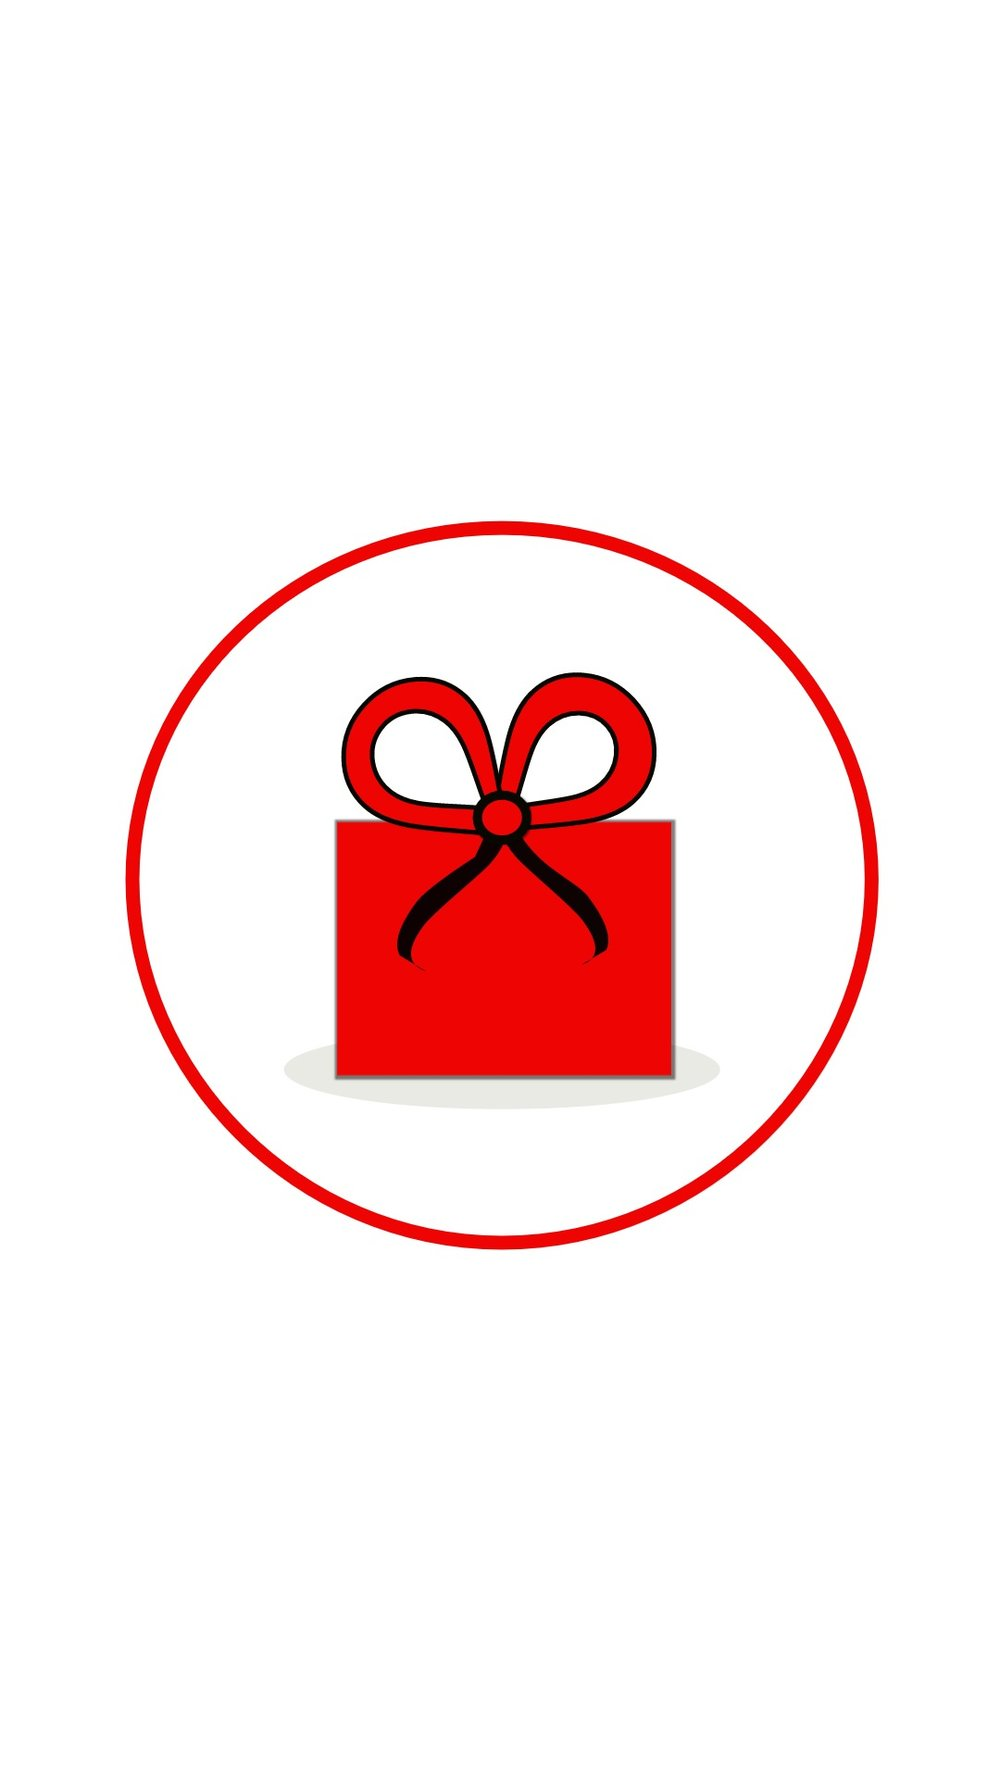 Instagram-cover-box-red-white-lotnotes.com.jpg